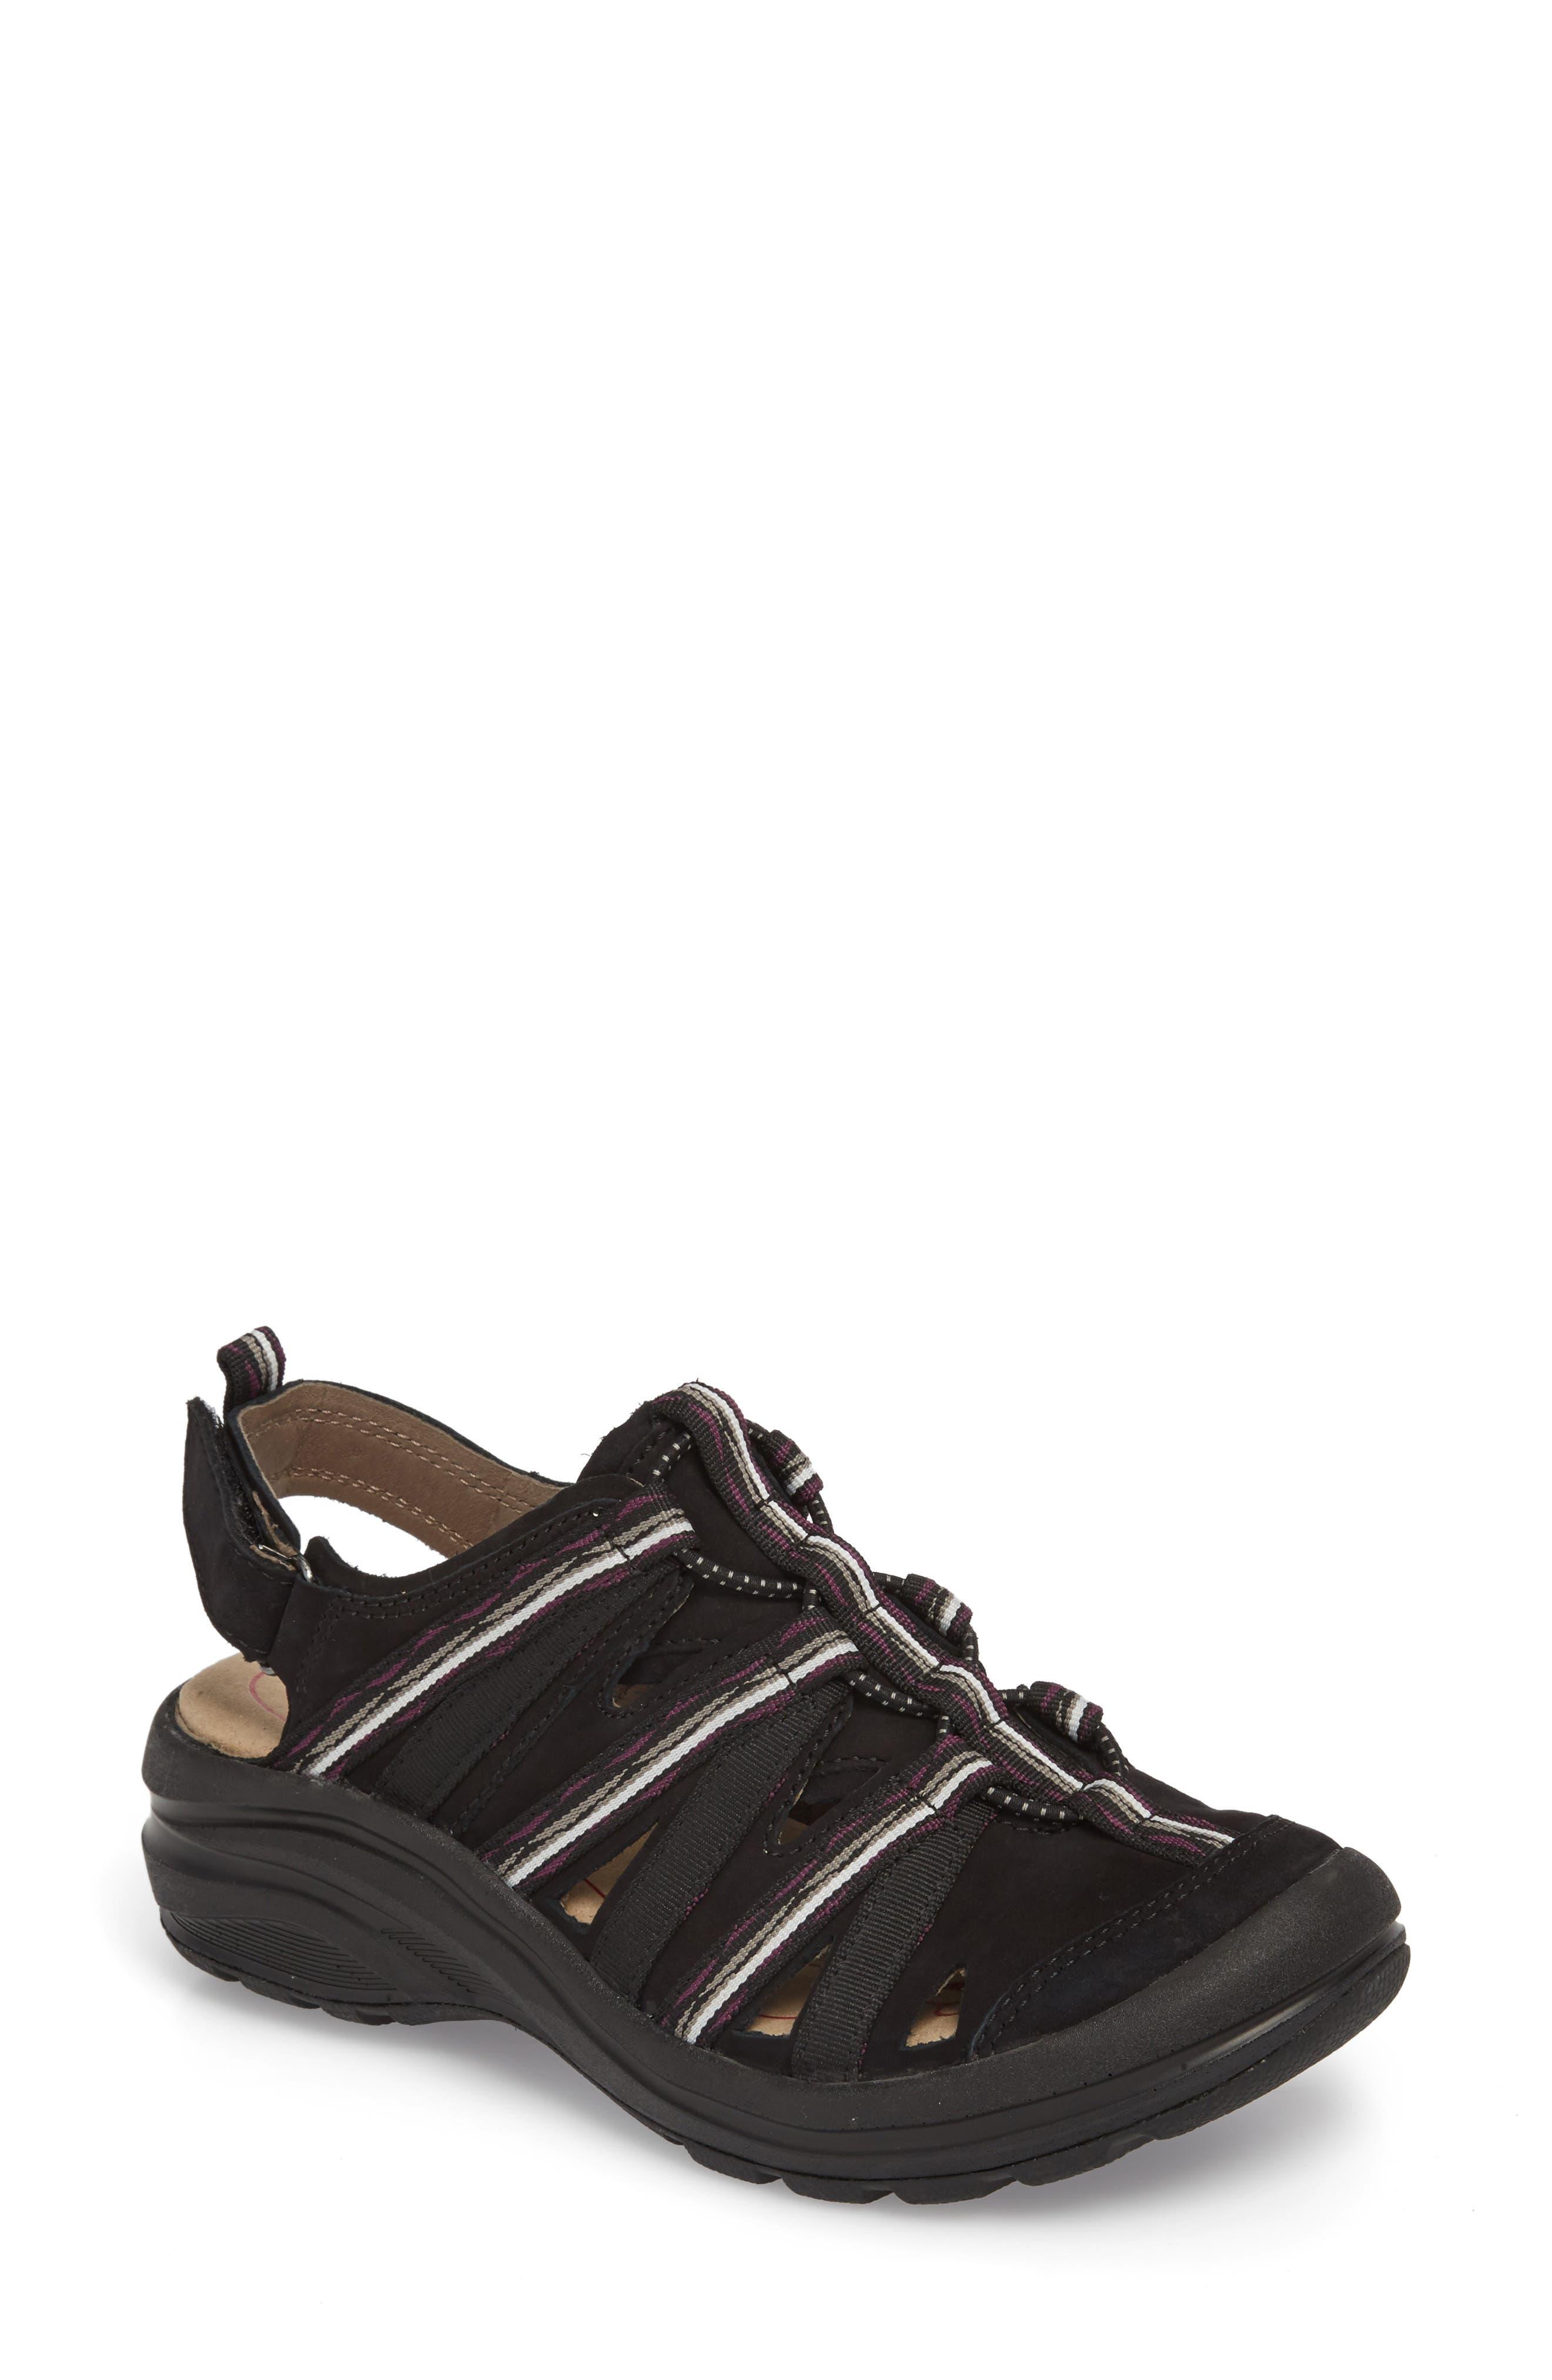 Malabar Sport Sandal,                             Main thumbnail 1, color,                             BLACK LEATHER